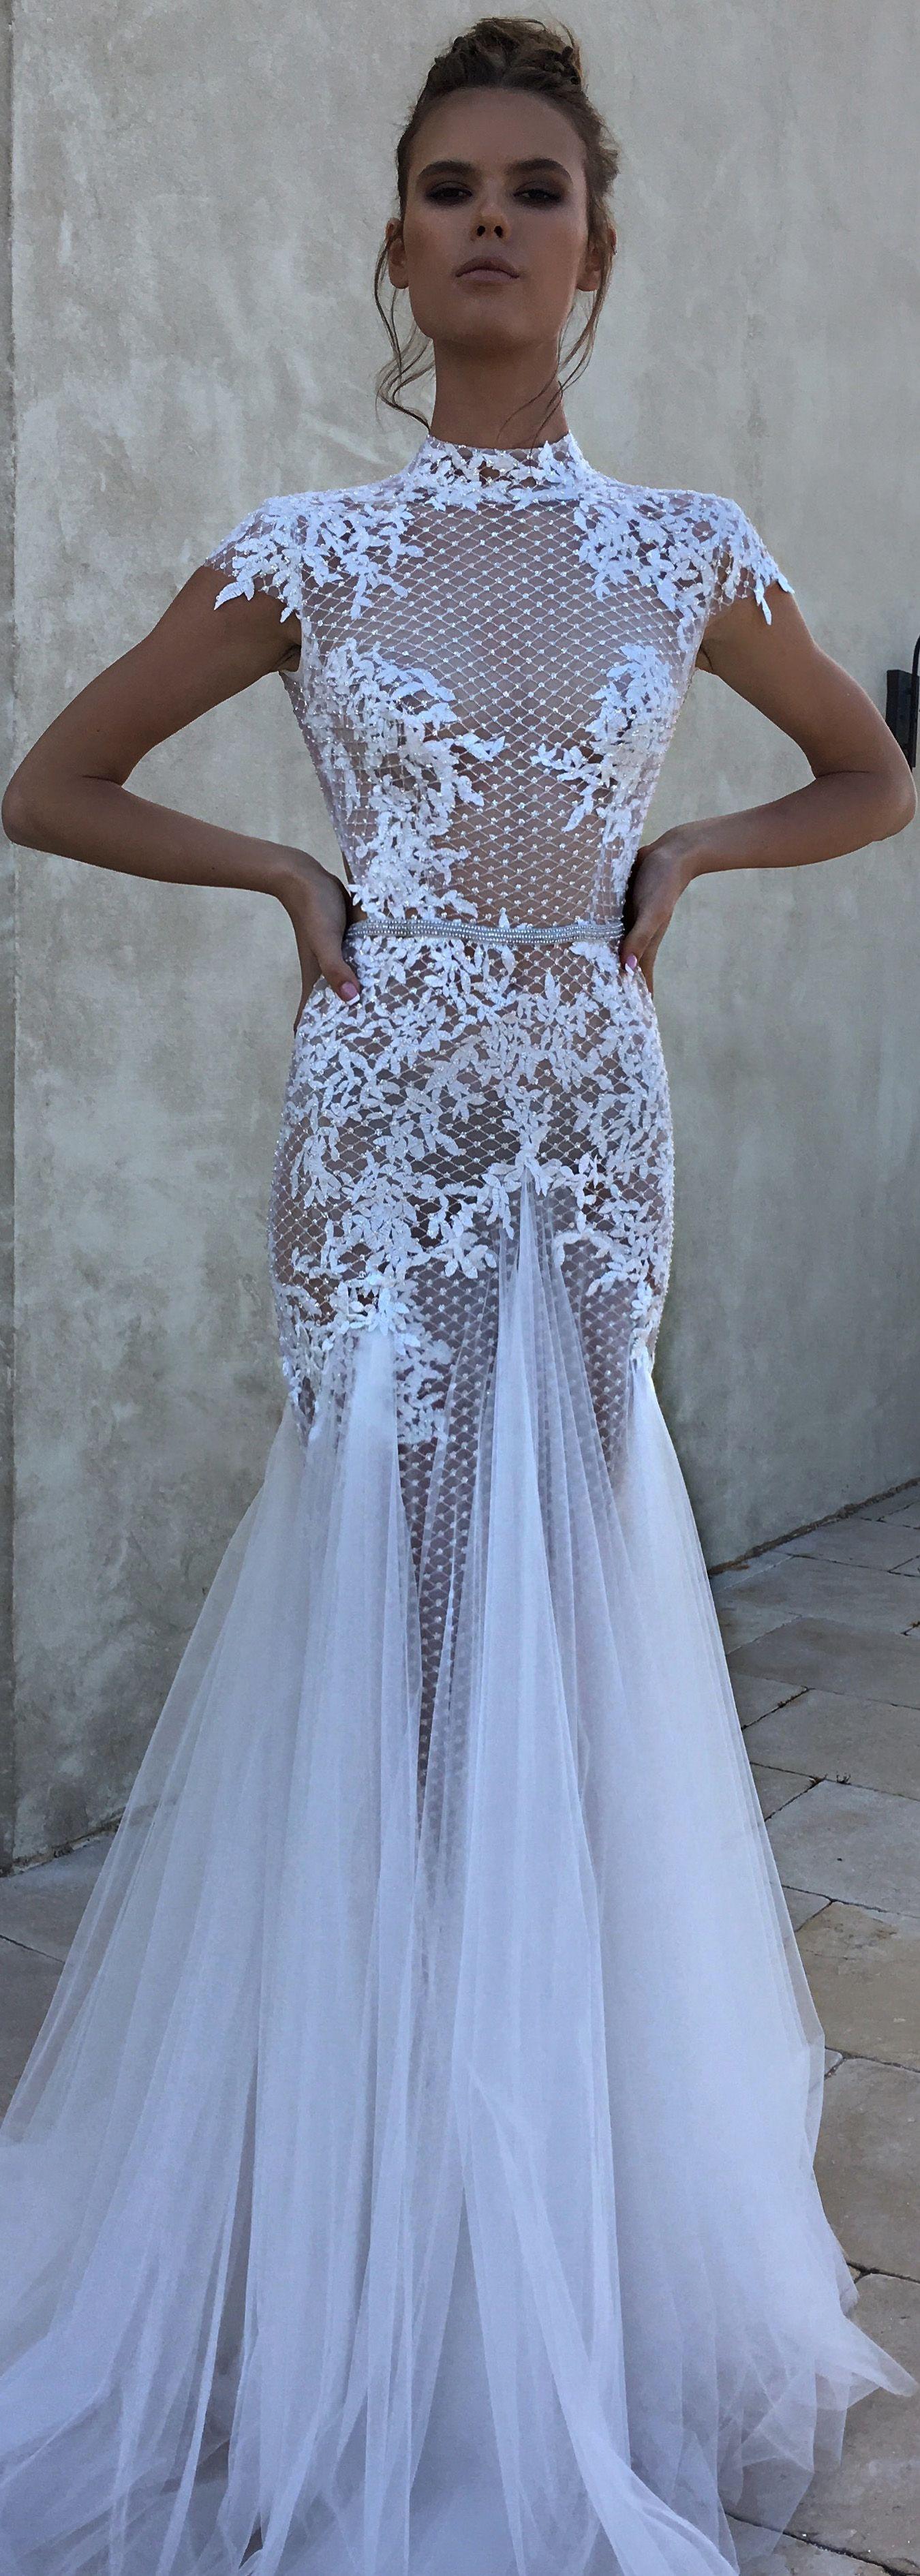 Wedding Dress by Berta Bridal | @beratbridal. | I\'ve been dreaming ...